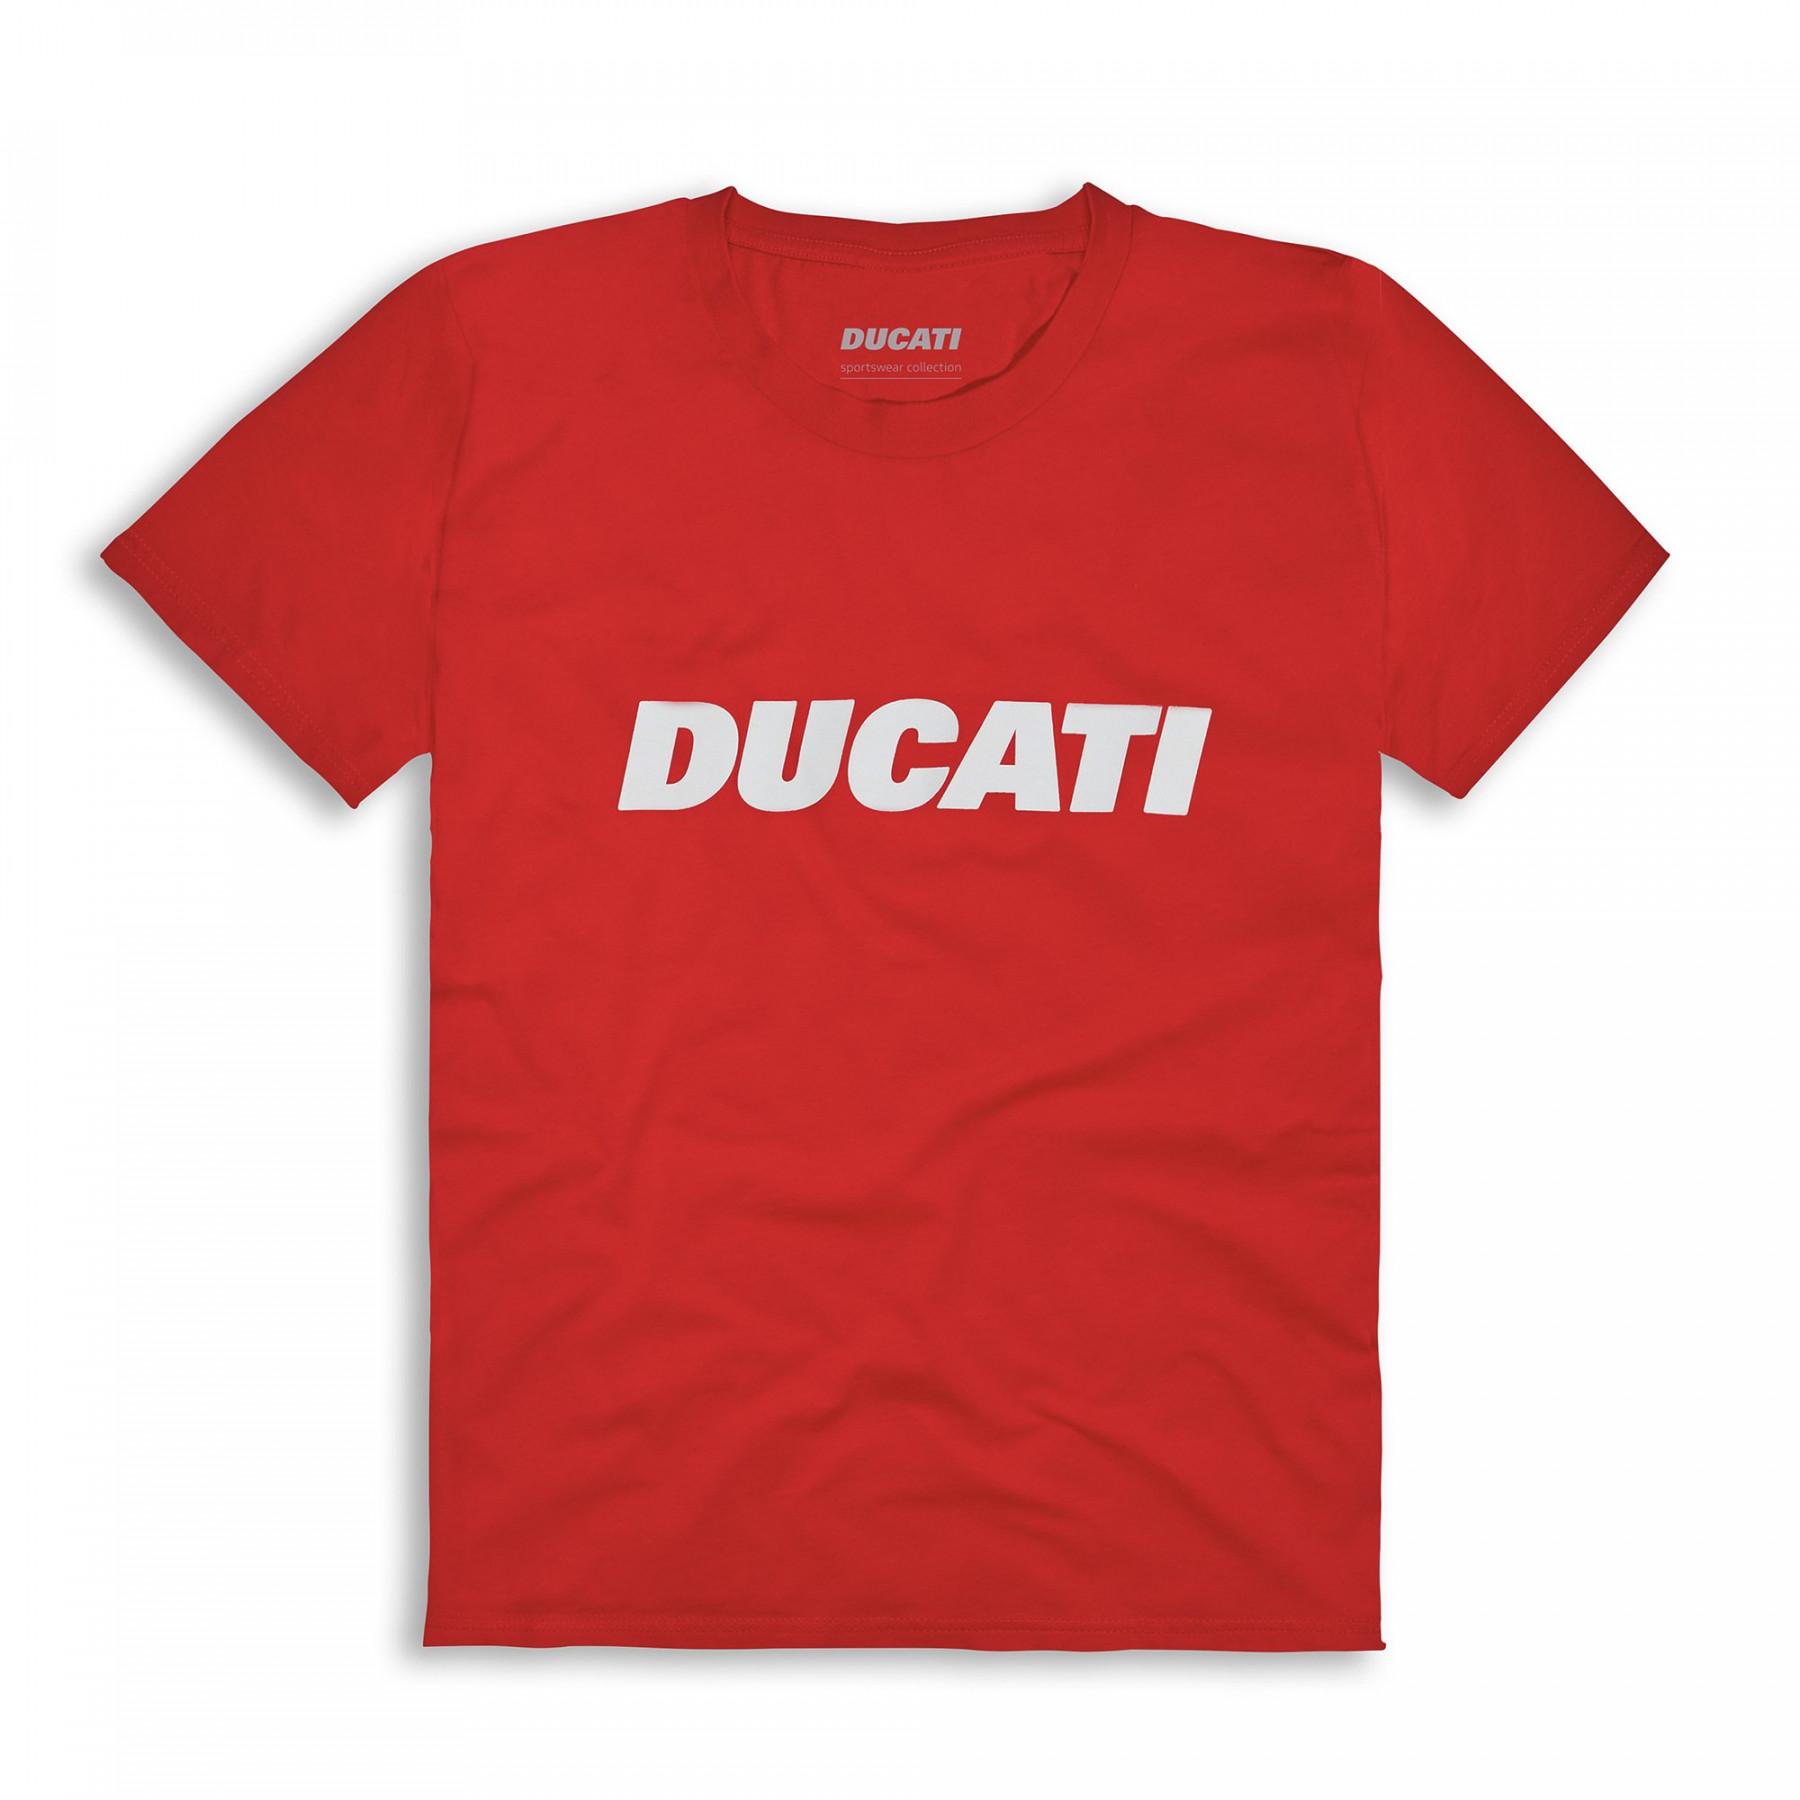 Tshirt Ducatiana 2.0 kids